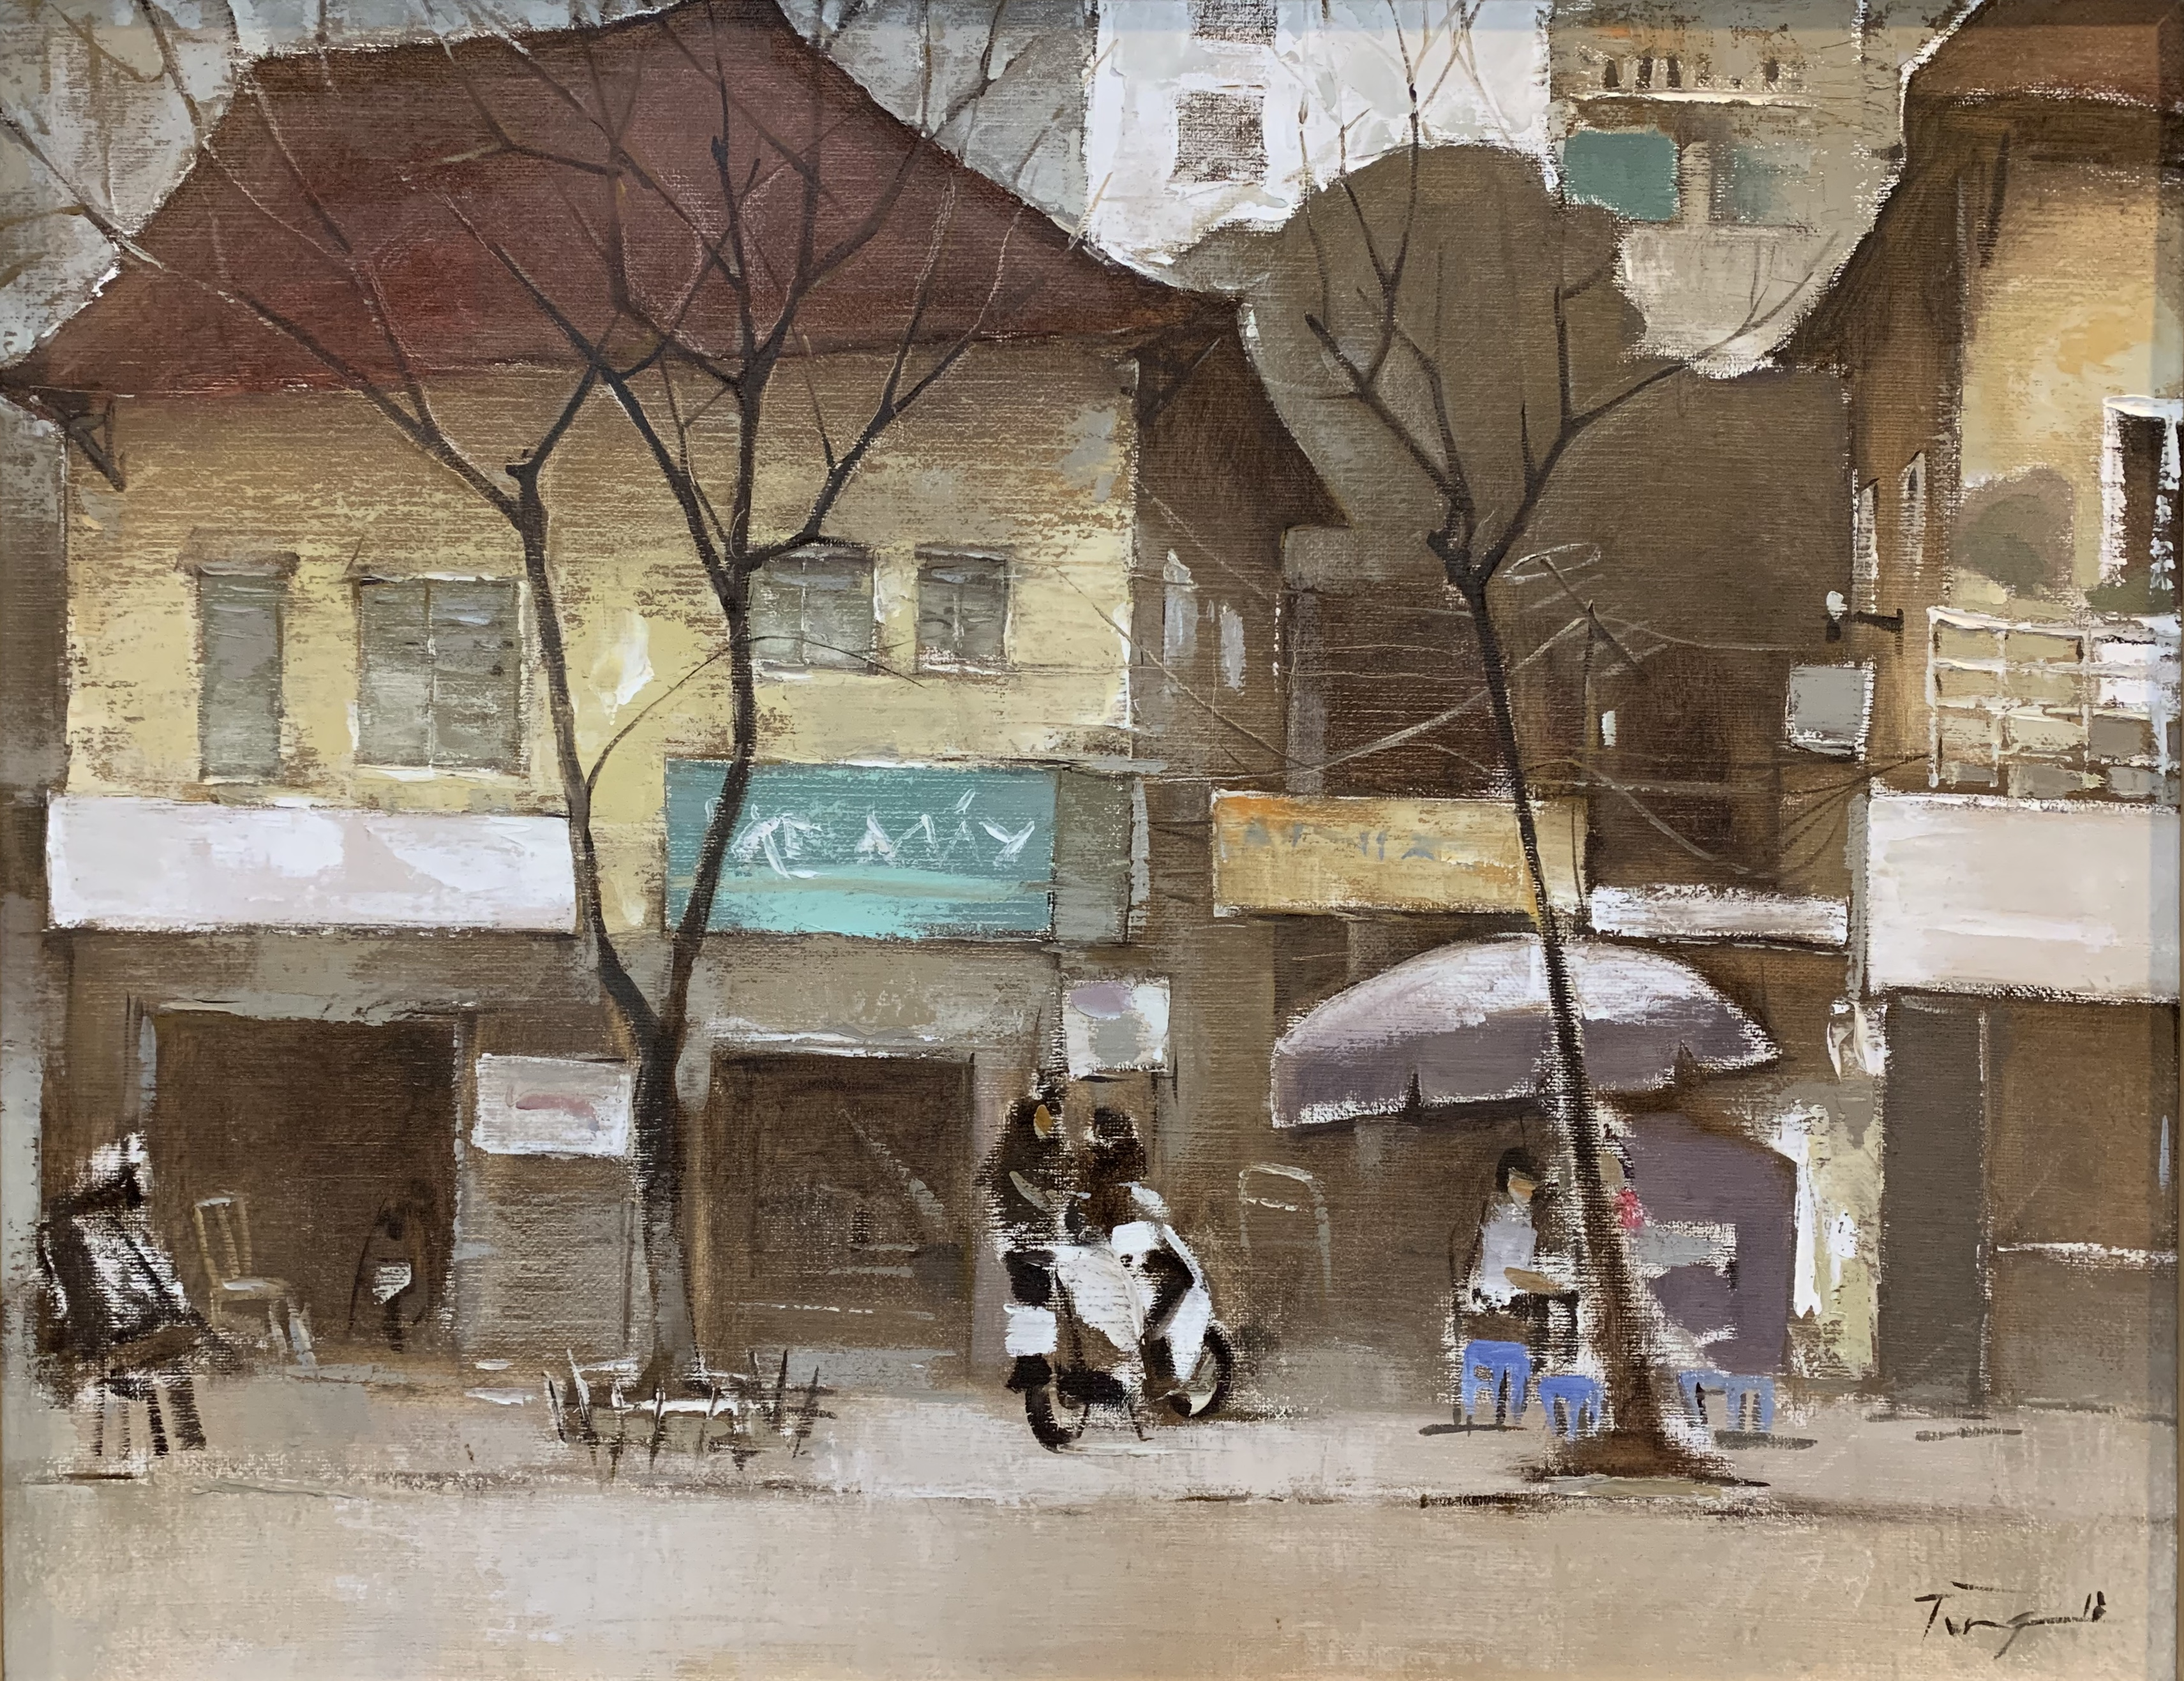 Old Street | Phố Xưa